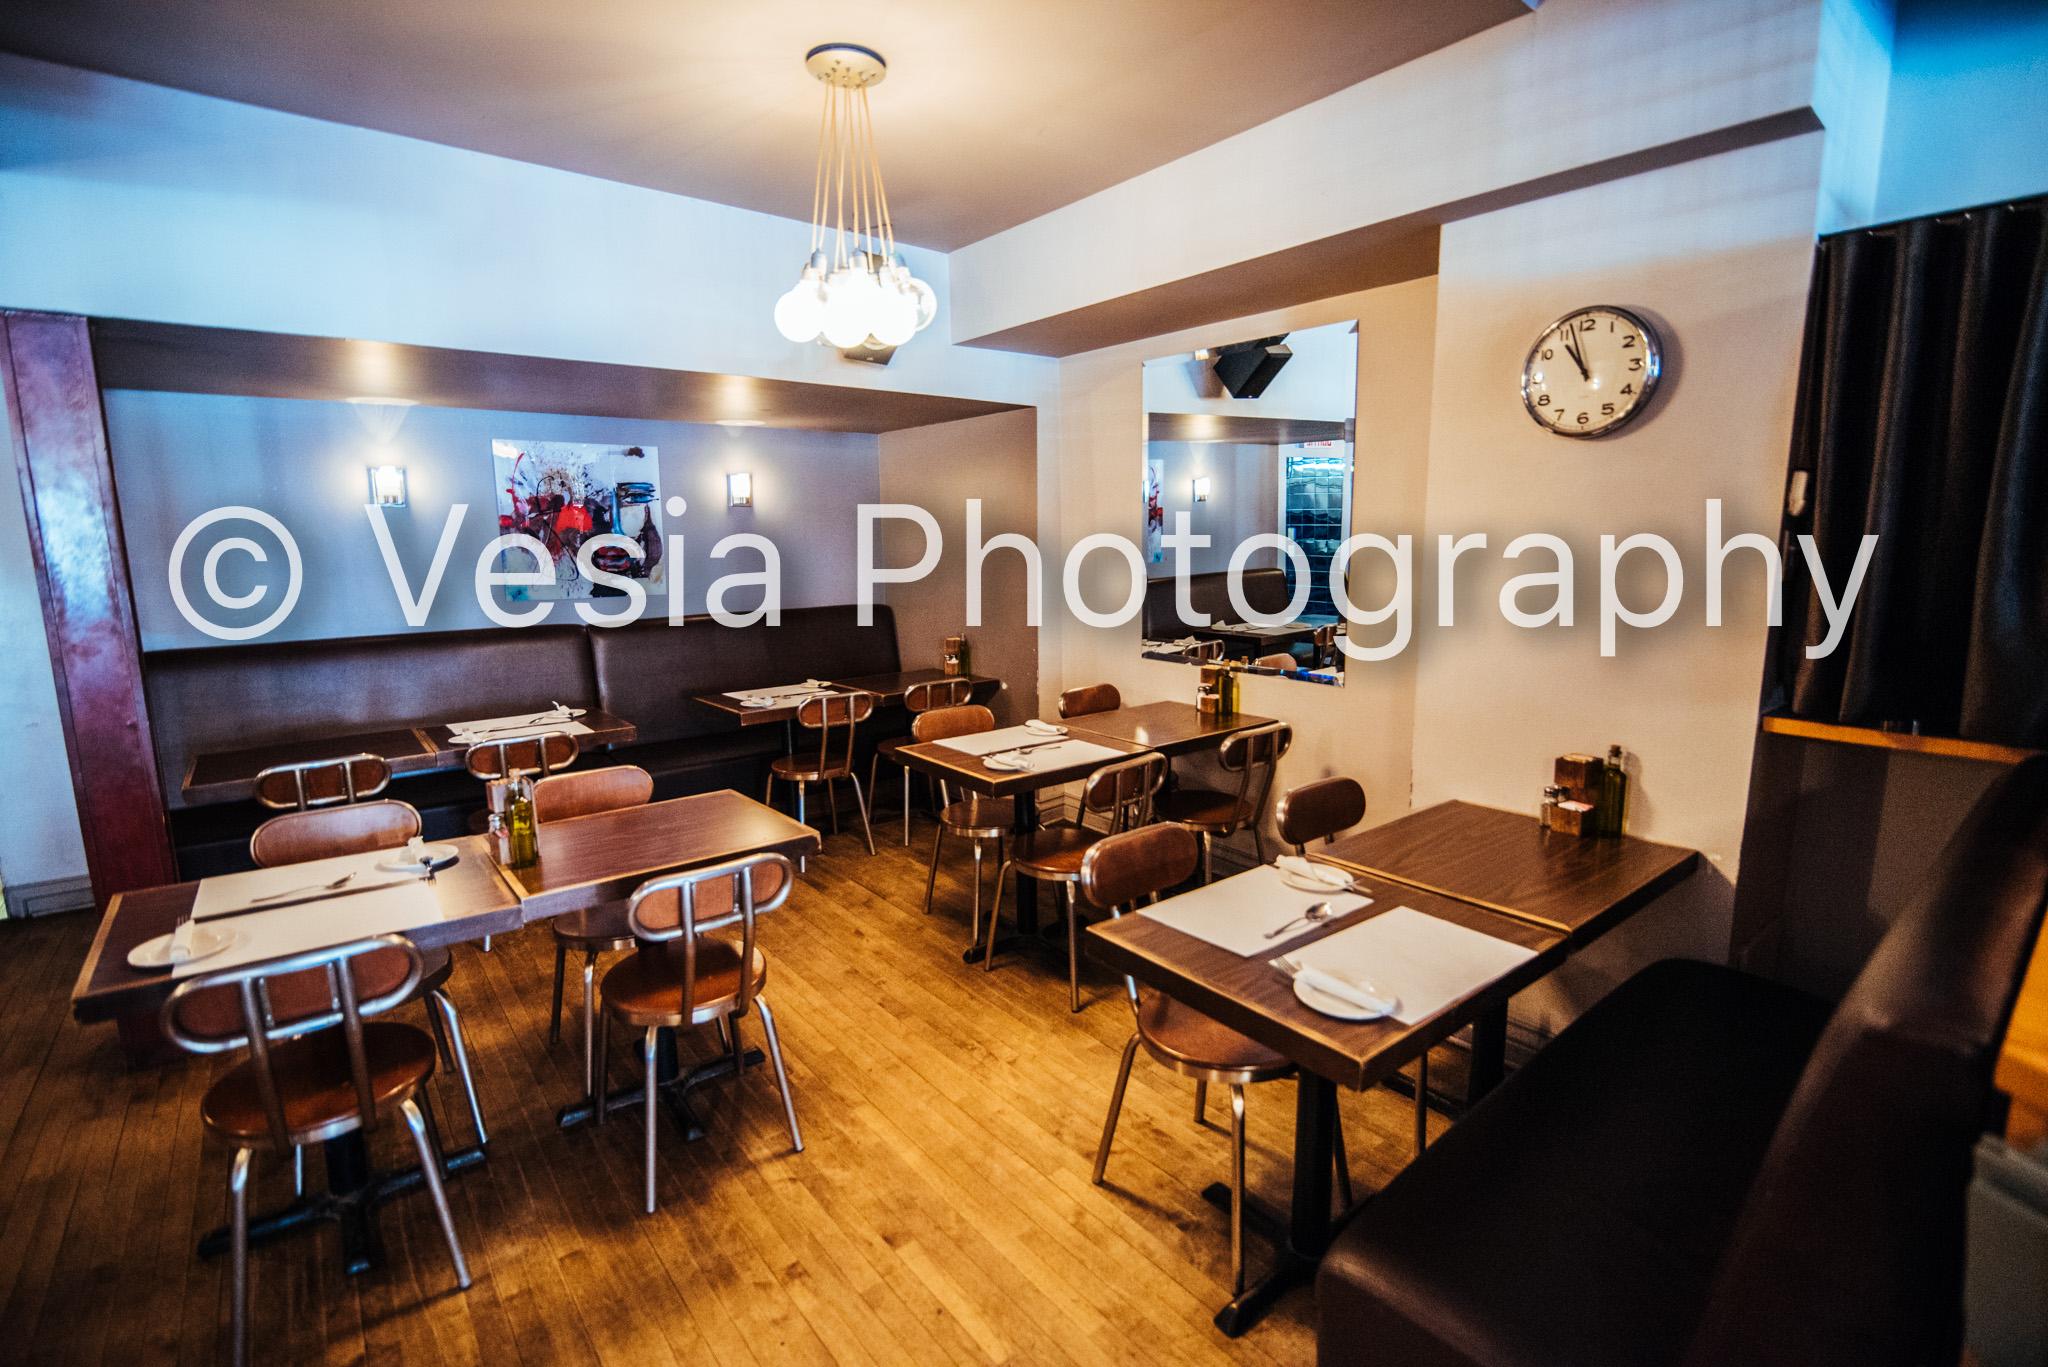 Cafe_Epoca_Proofs-10.jpg